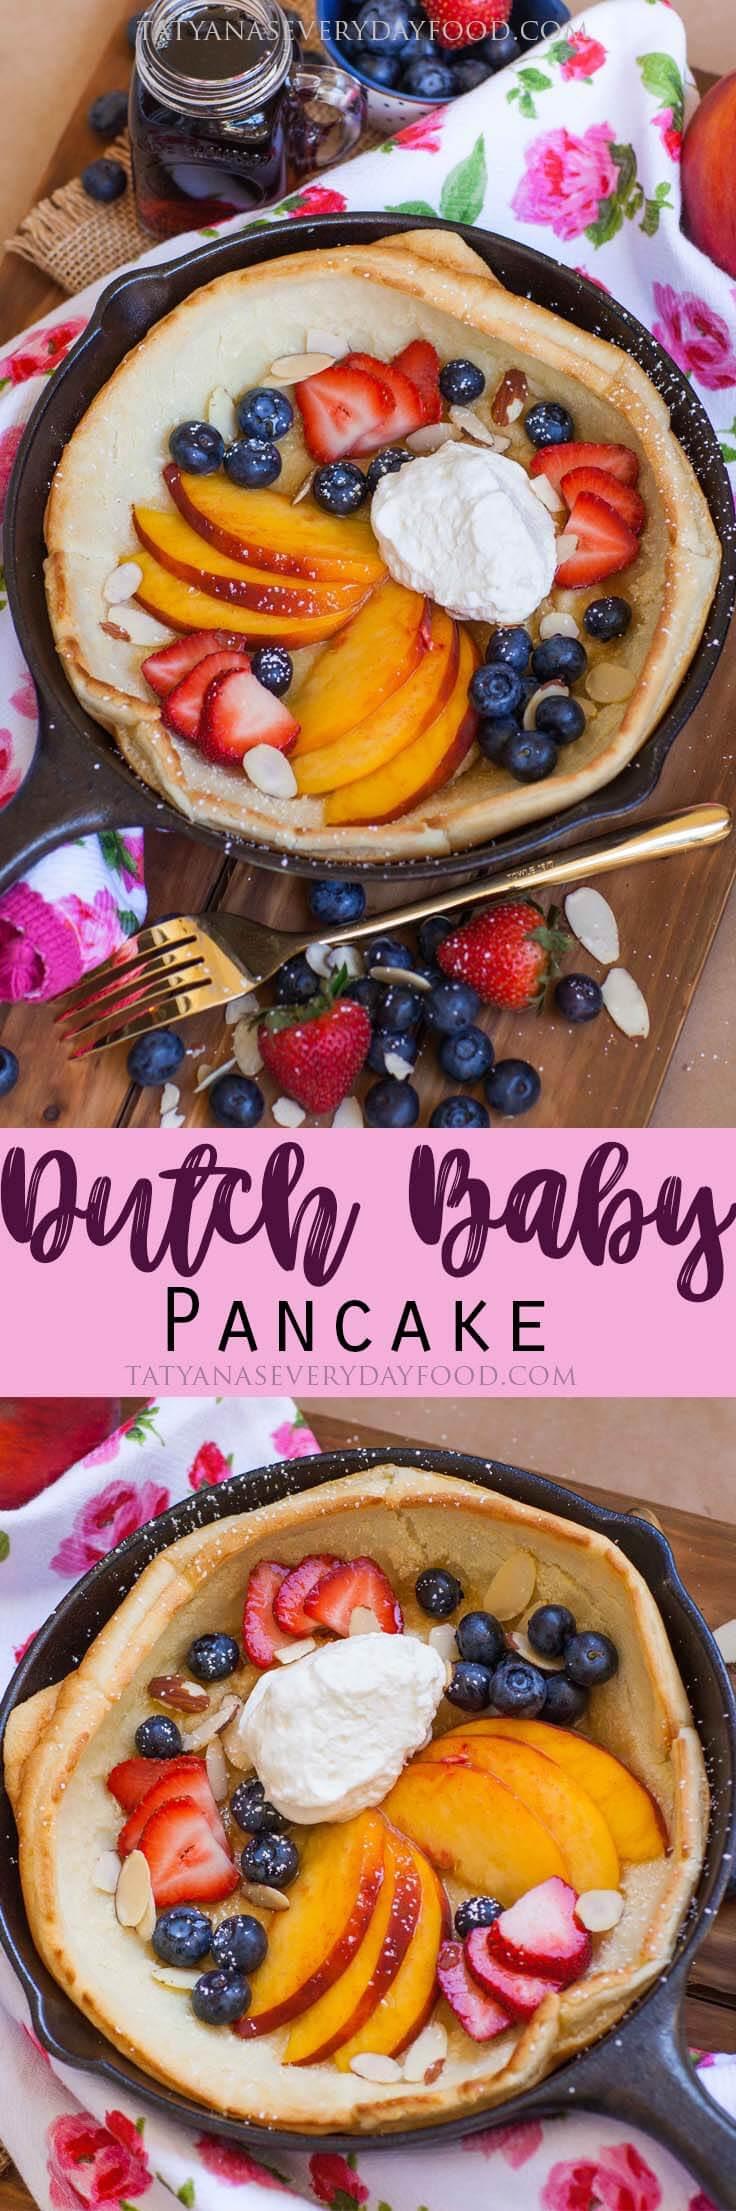 Easy Dutch Baby Pancake Recipe for breakfast